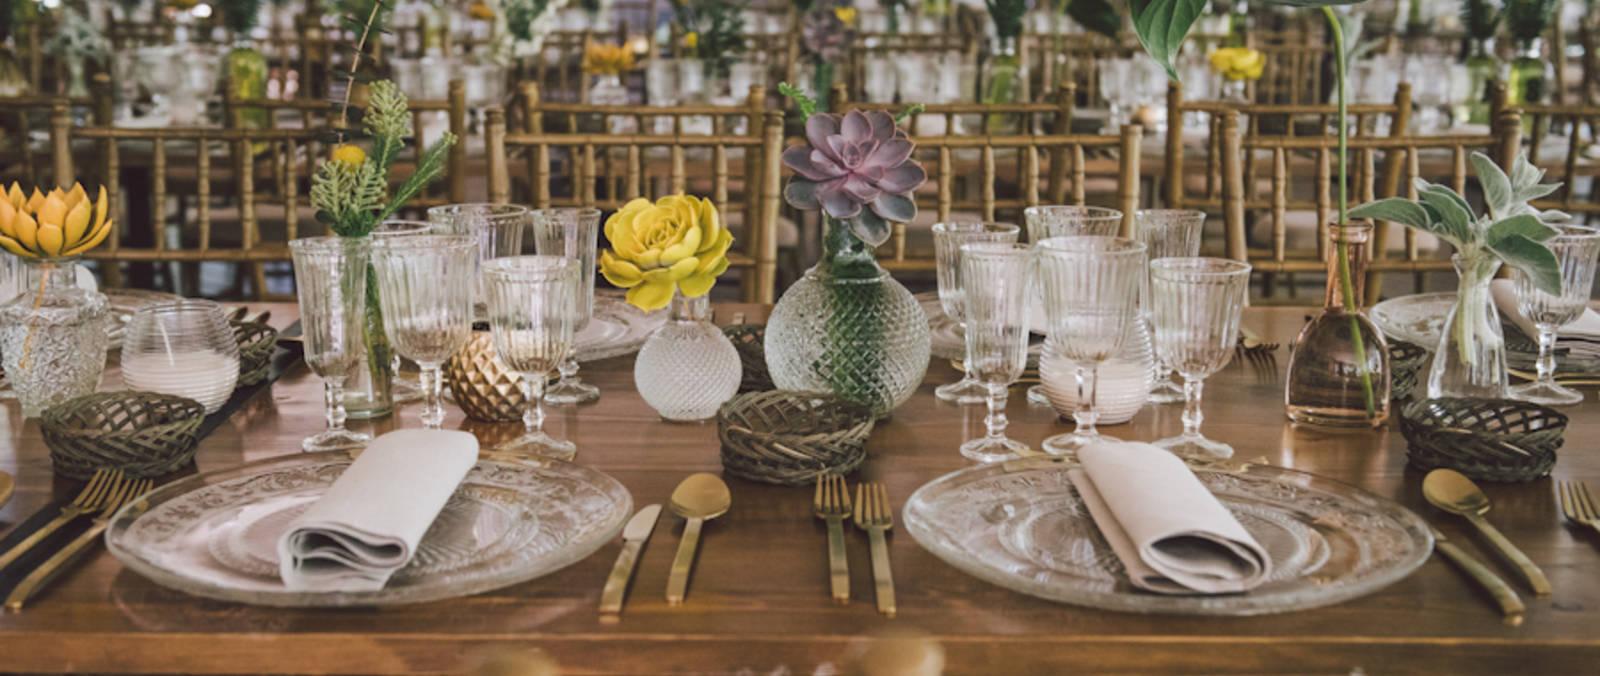 Decoraci n y alquiler para bodas bodas de verano for Alquiler decoracion bodas